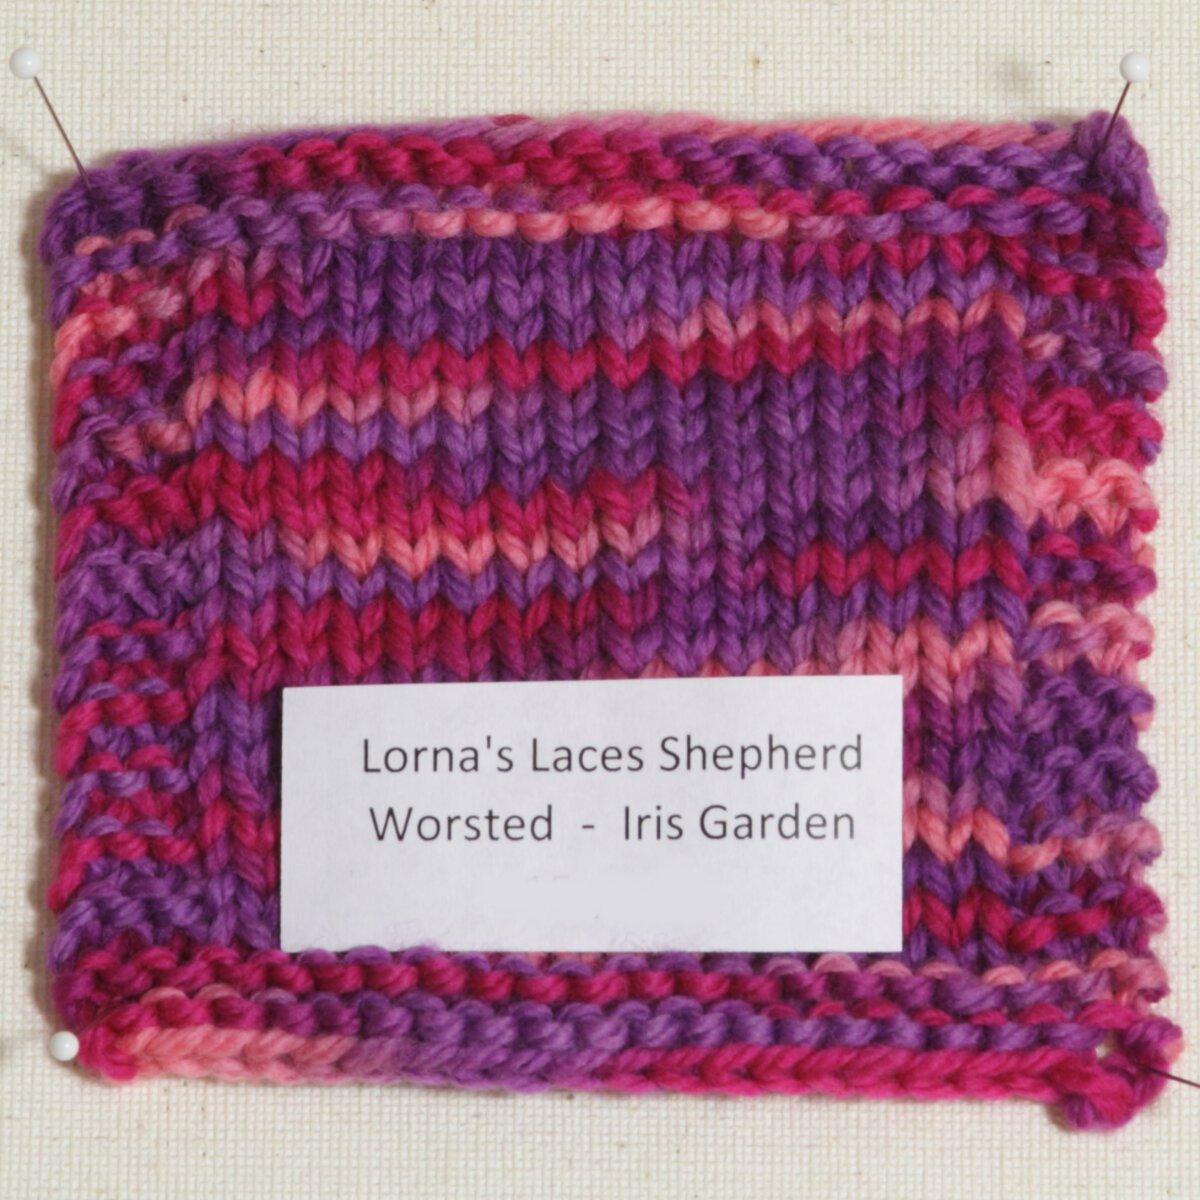 Lornas Laces Shepherd Worsted Samples Yarn - Iris Garden at Jimmy Beans ...